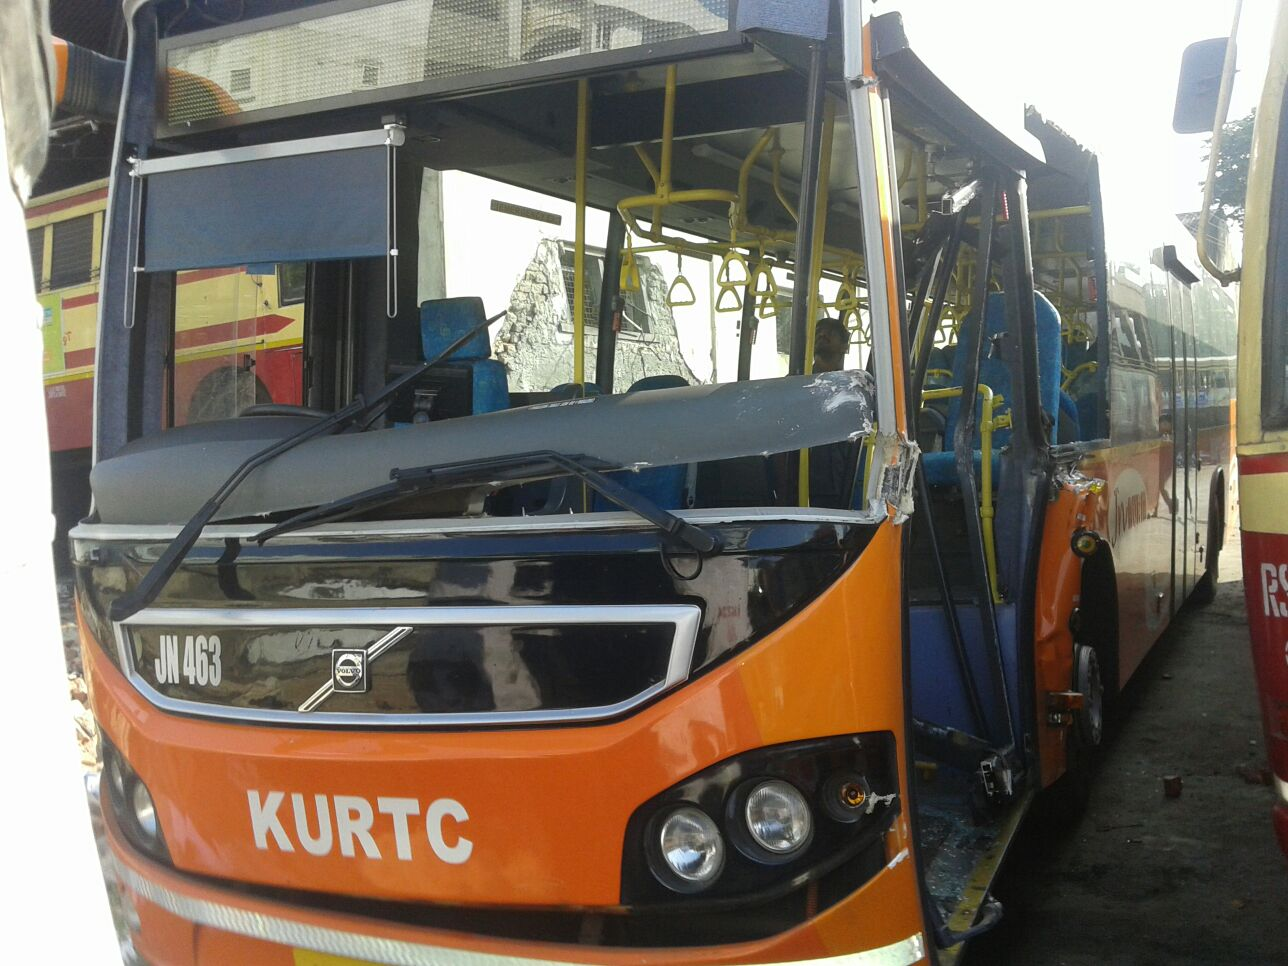 KURTC Volvo Bus Accident Near Palakkad | KSRTC IMAGE DATABASE